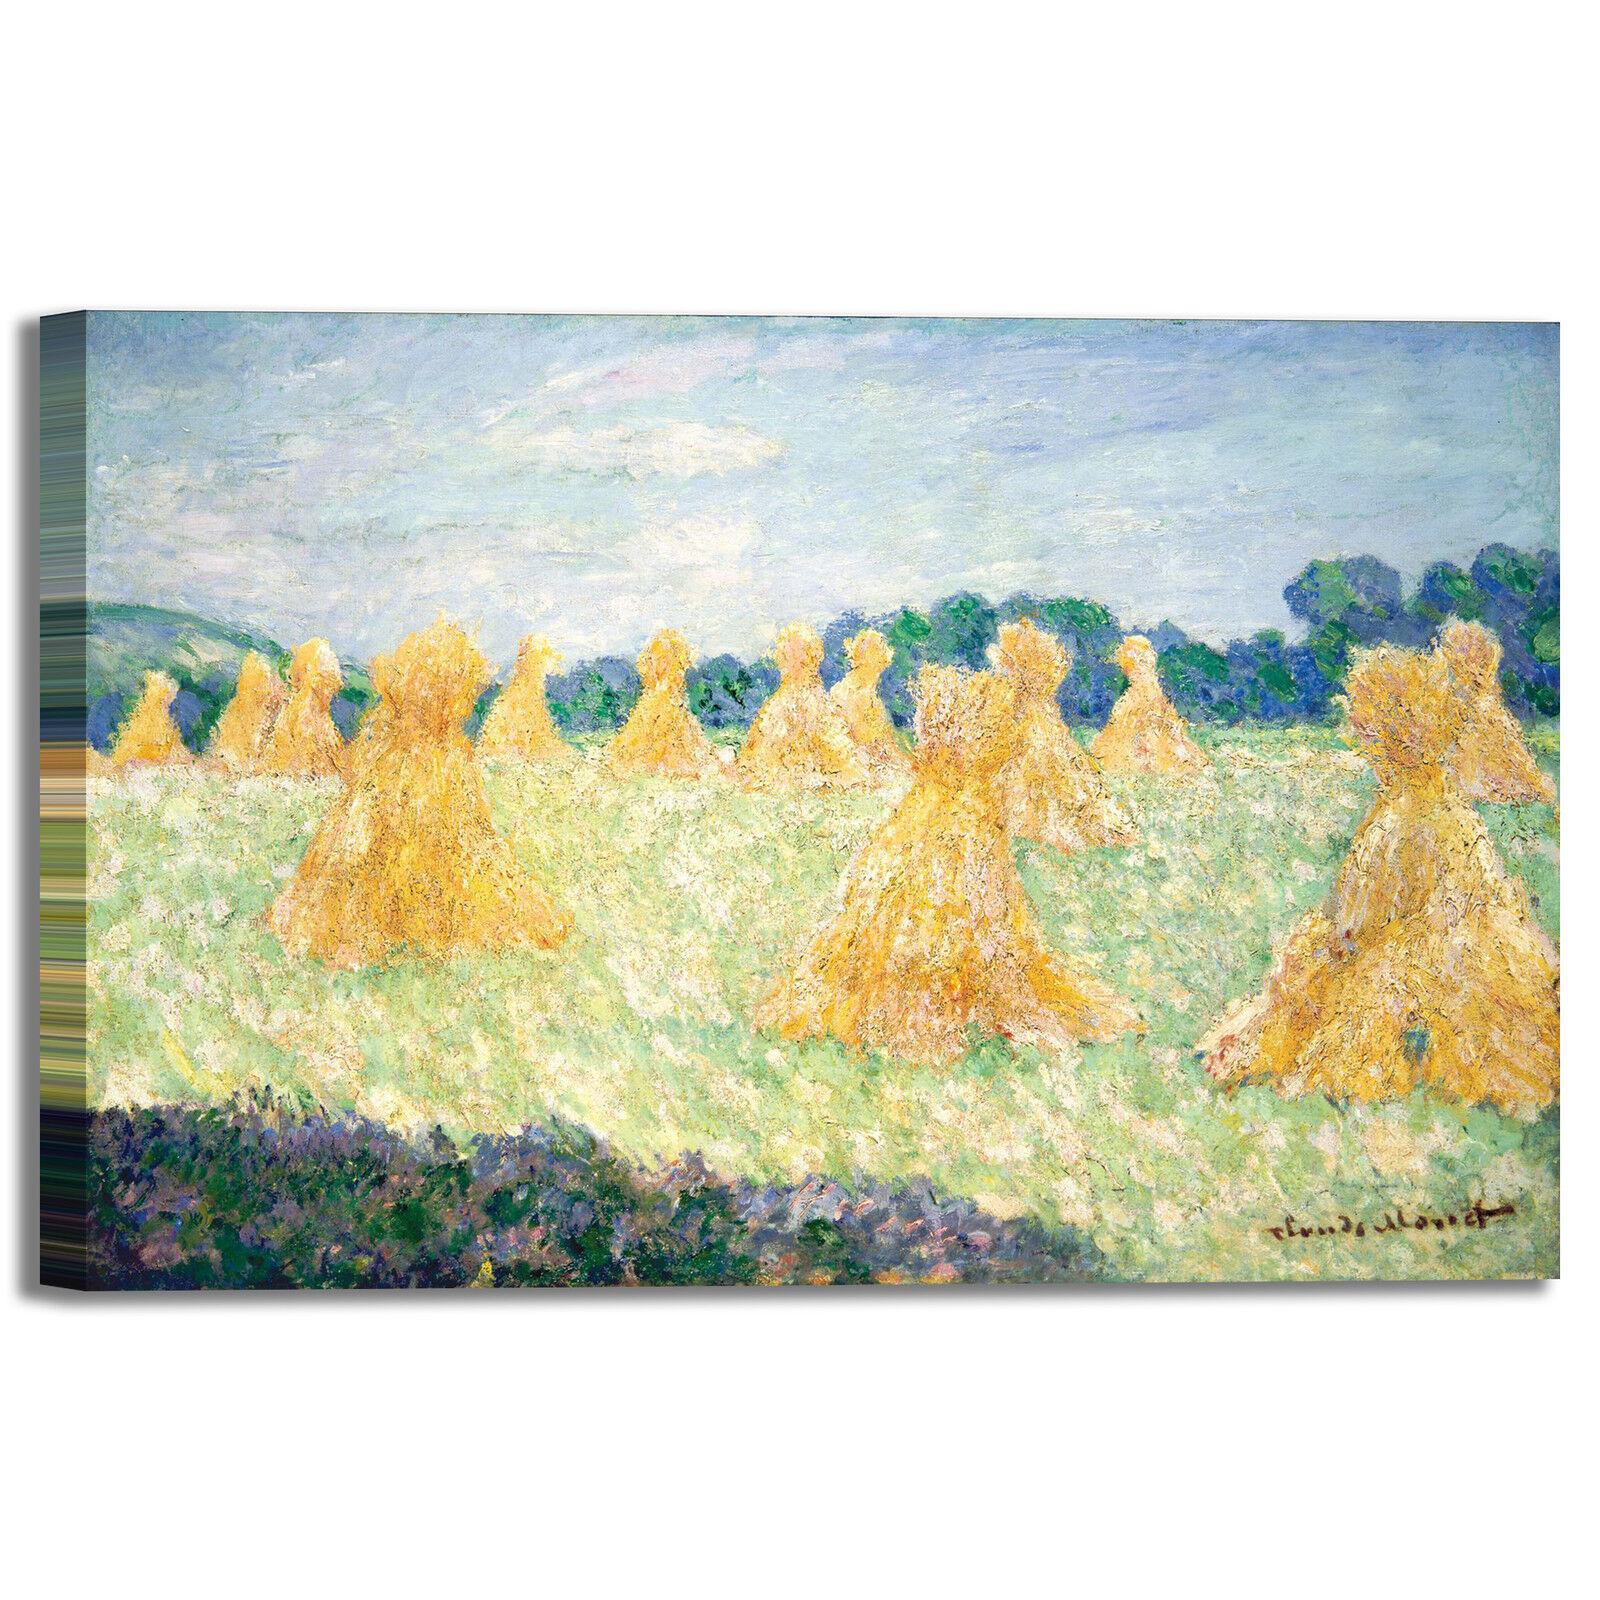 Monet signorine di Giverny design quadro stampa tela dipinto telaio casa arRouge o casa telaio 8b3ee8